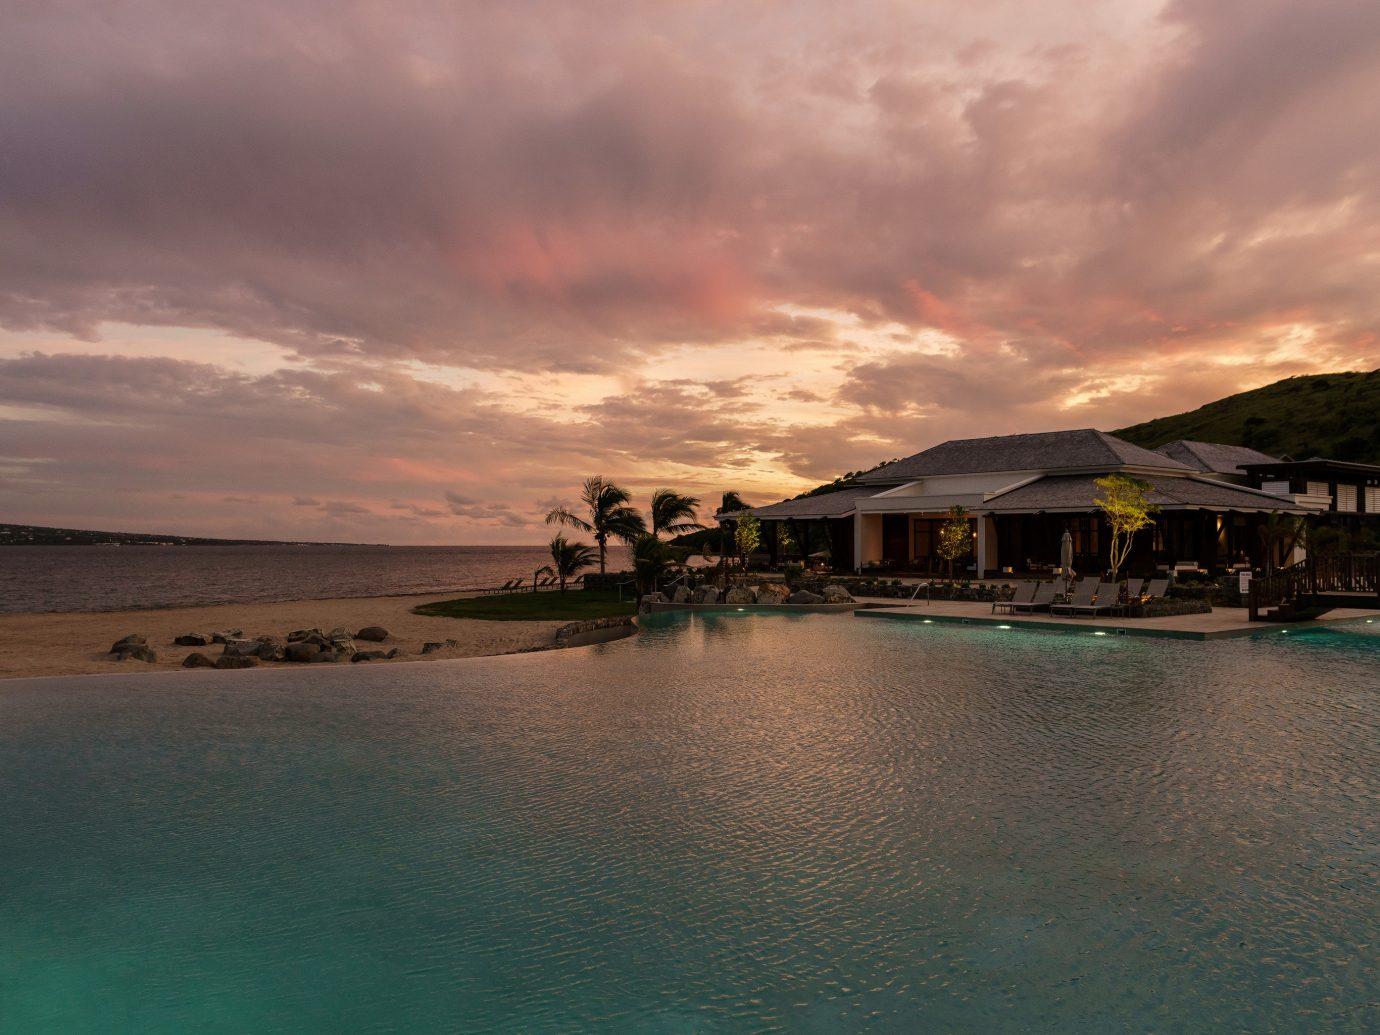 sky water Sea cloud Sunset horizon Ocean evening tropics clouds dusk shore Beach Coast Nature coastal and oceanic landforms caribbean calm sunrise cloudy dawn Lagoon landscape afterglow day